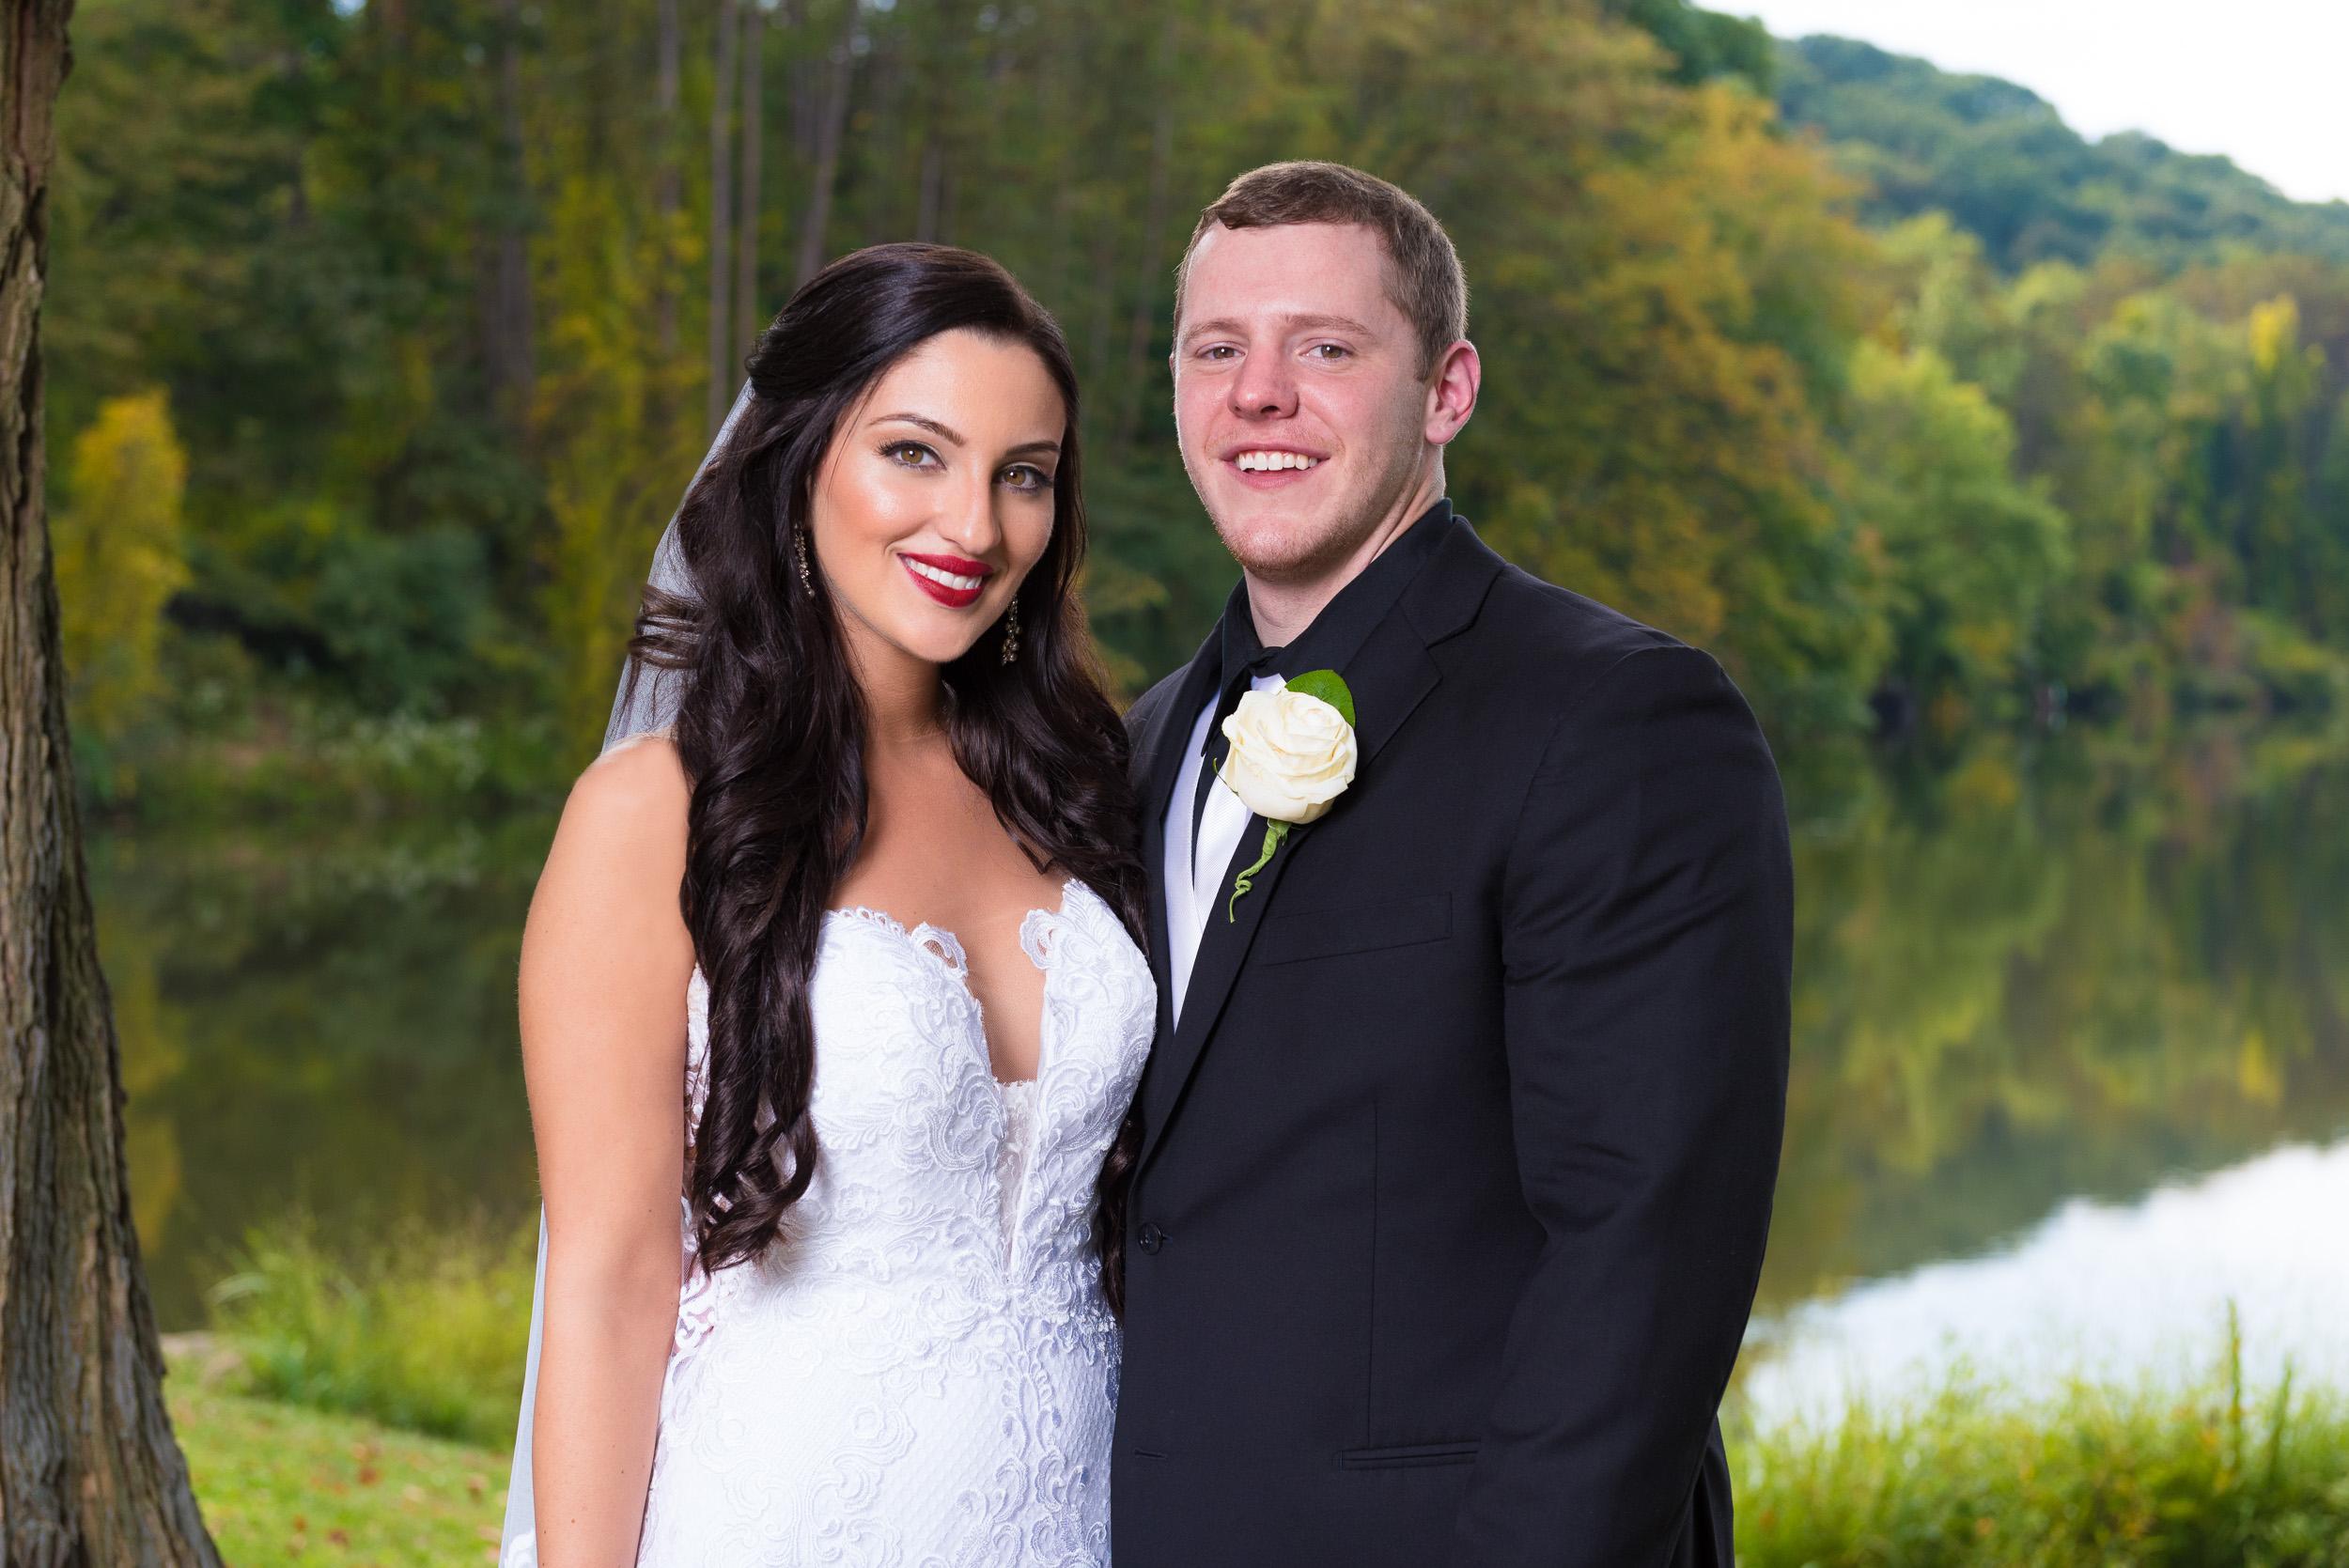 Bride-and-Groom-Portrait-North-Park-Lake-1.jpg